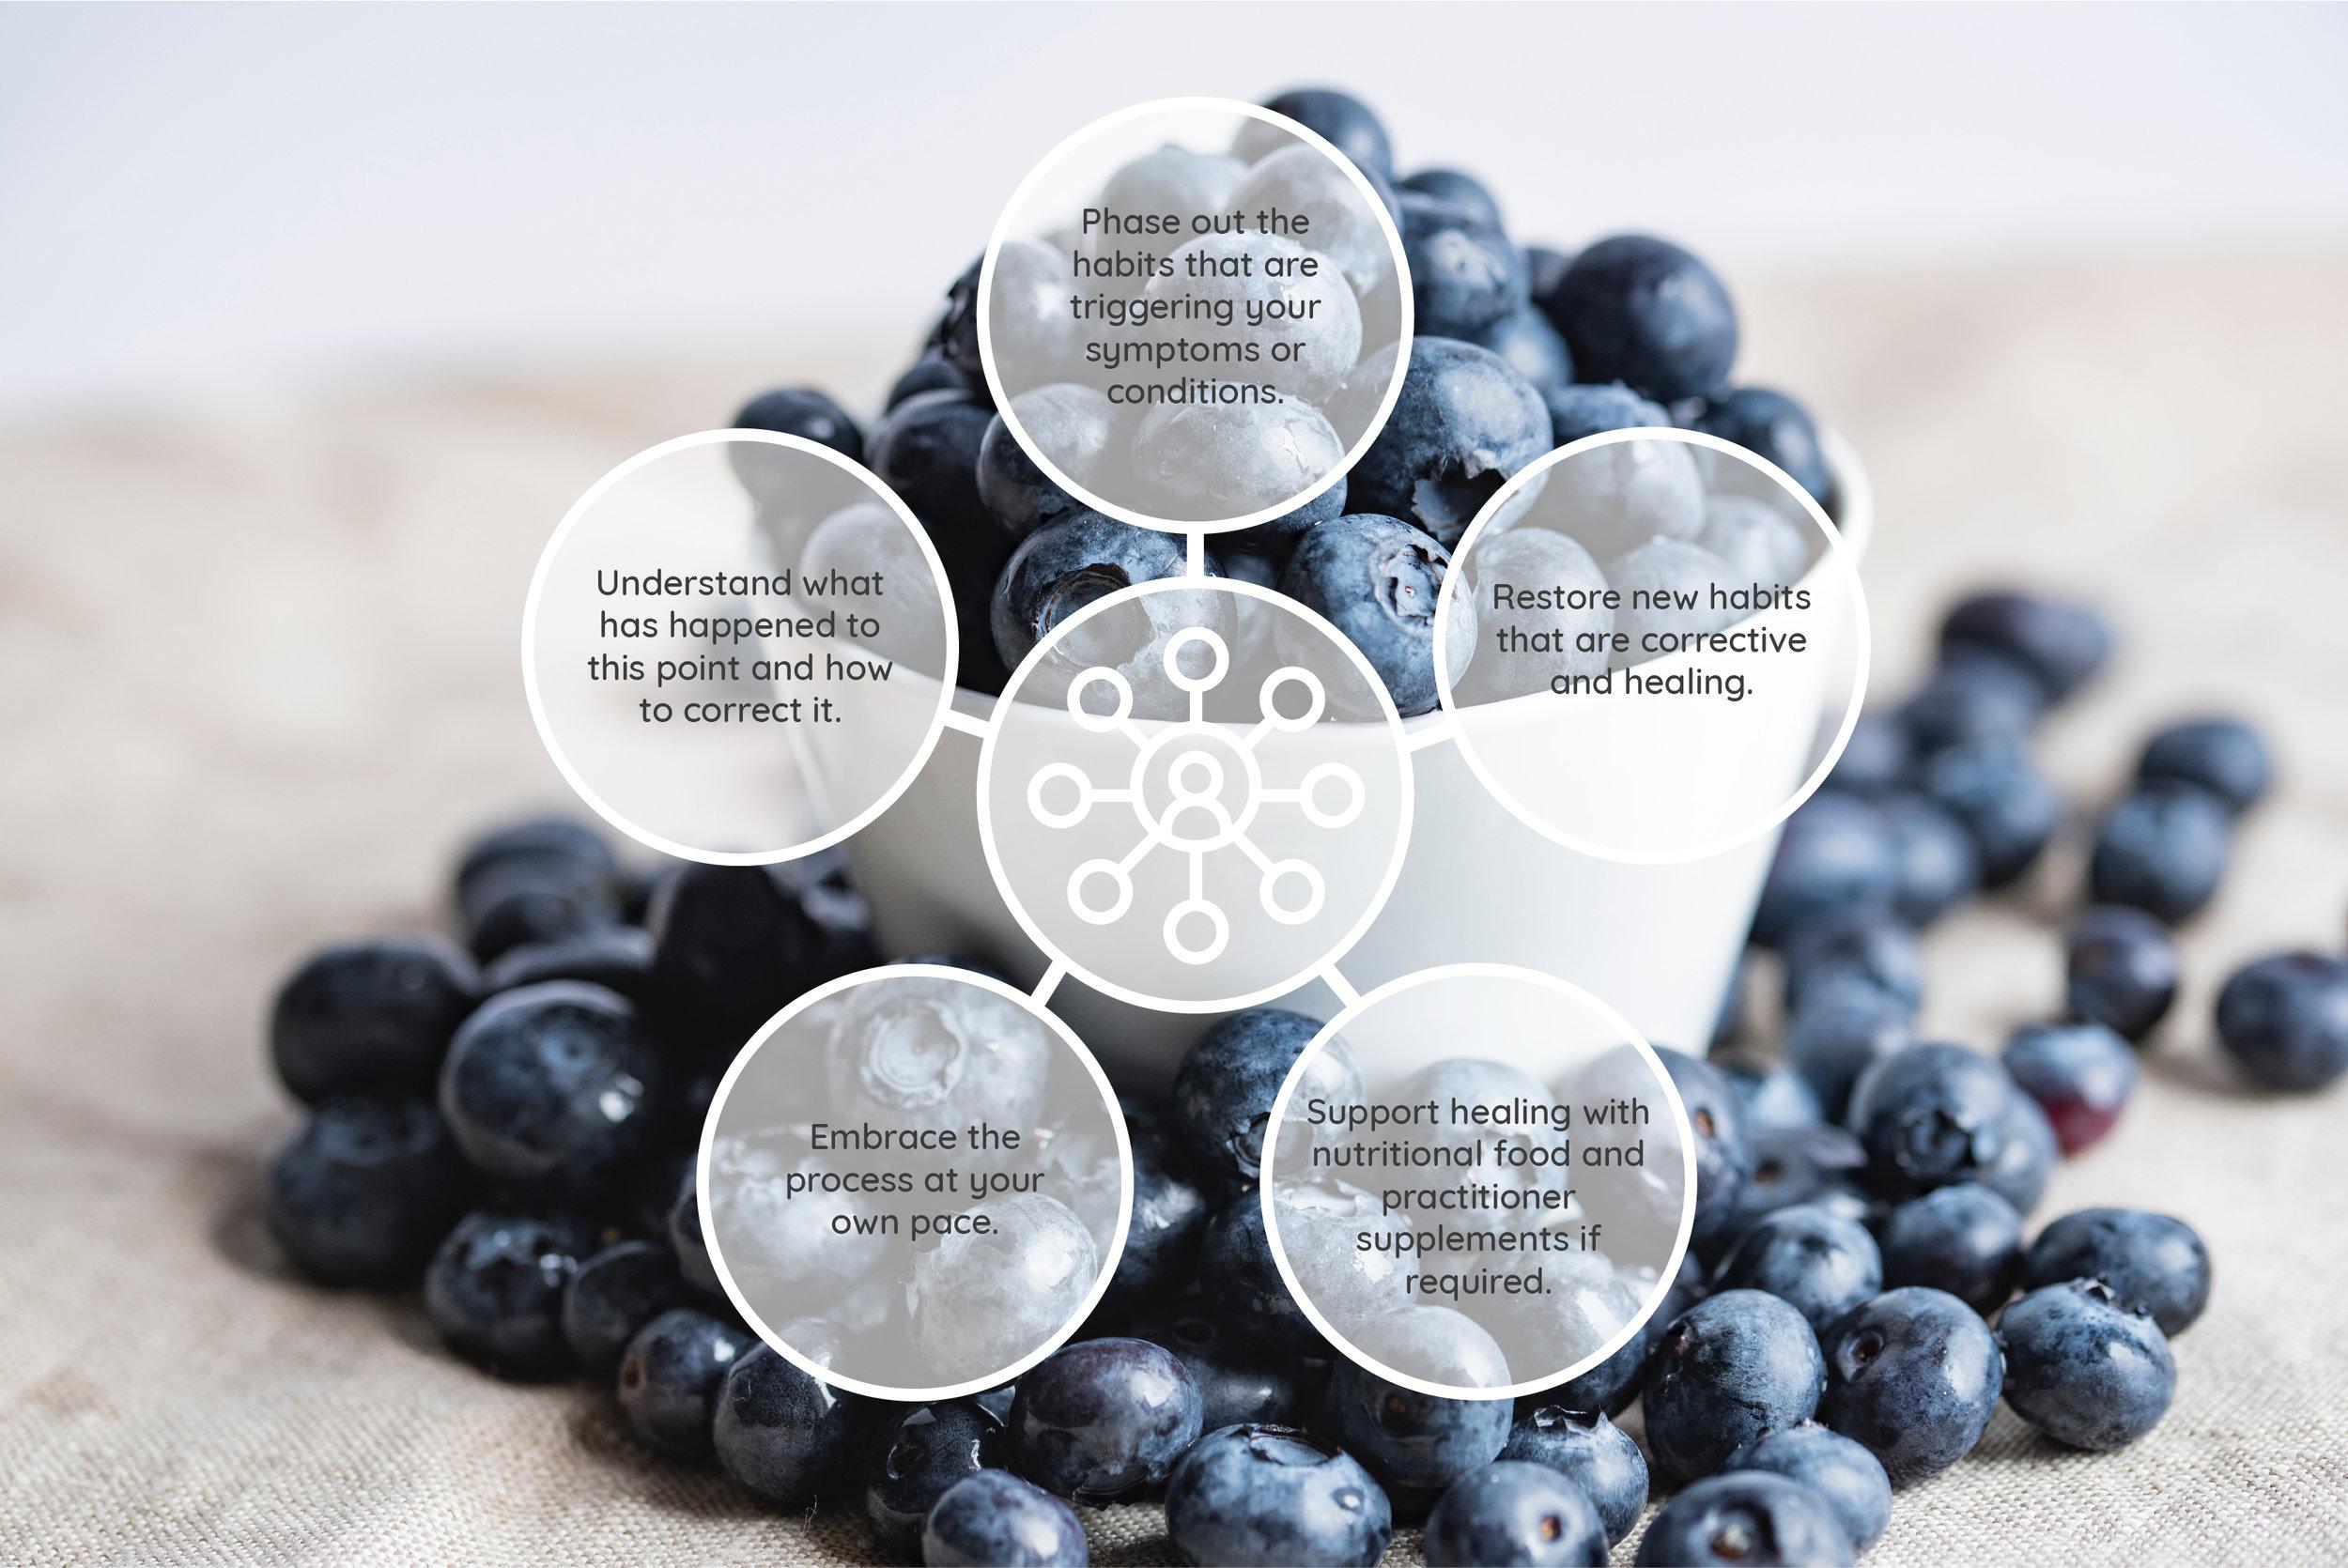 NutritionalModel_v2.jpg